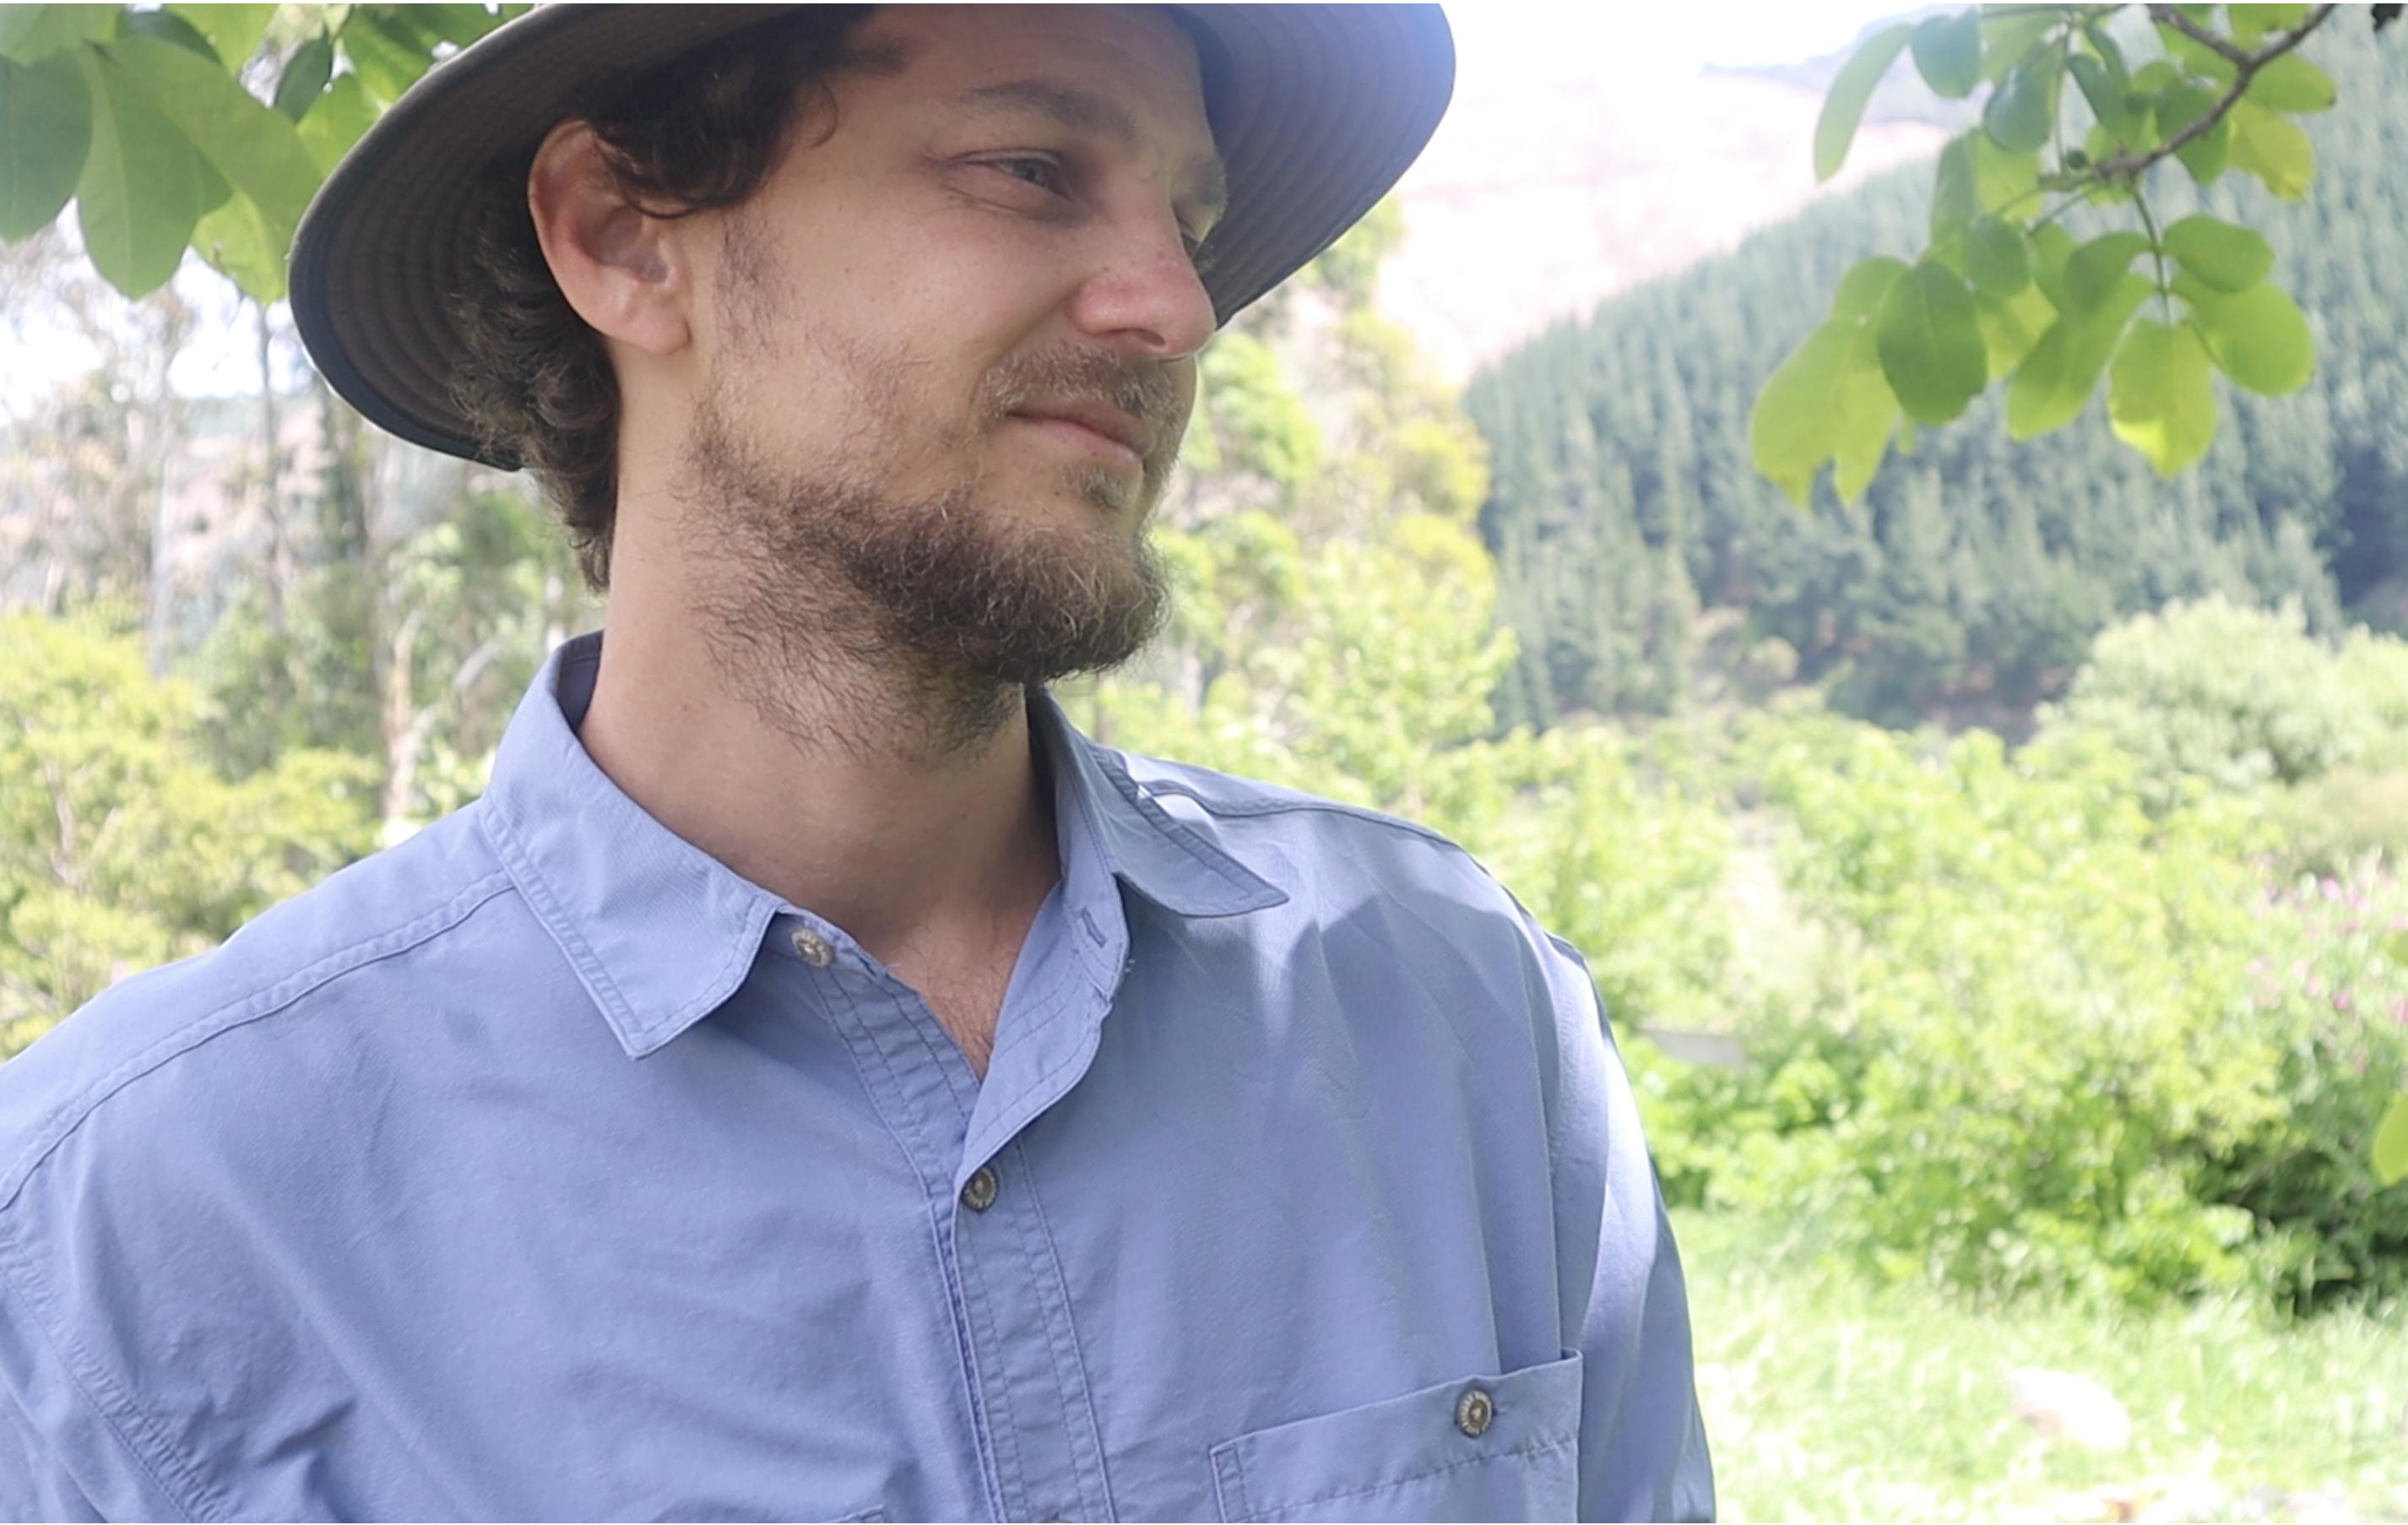 Dan de Klerk from Nomadic Permaculture